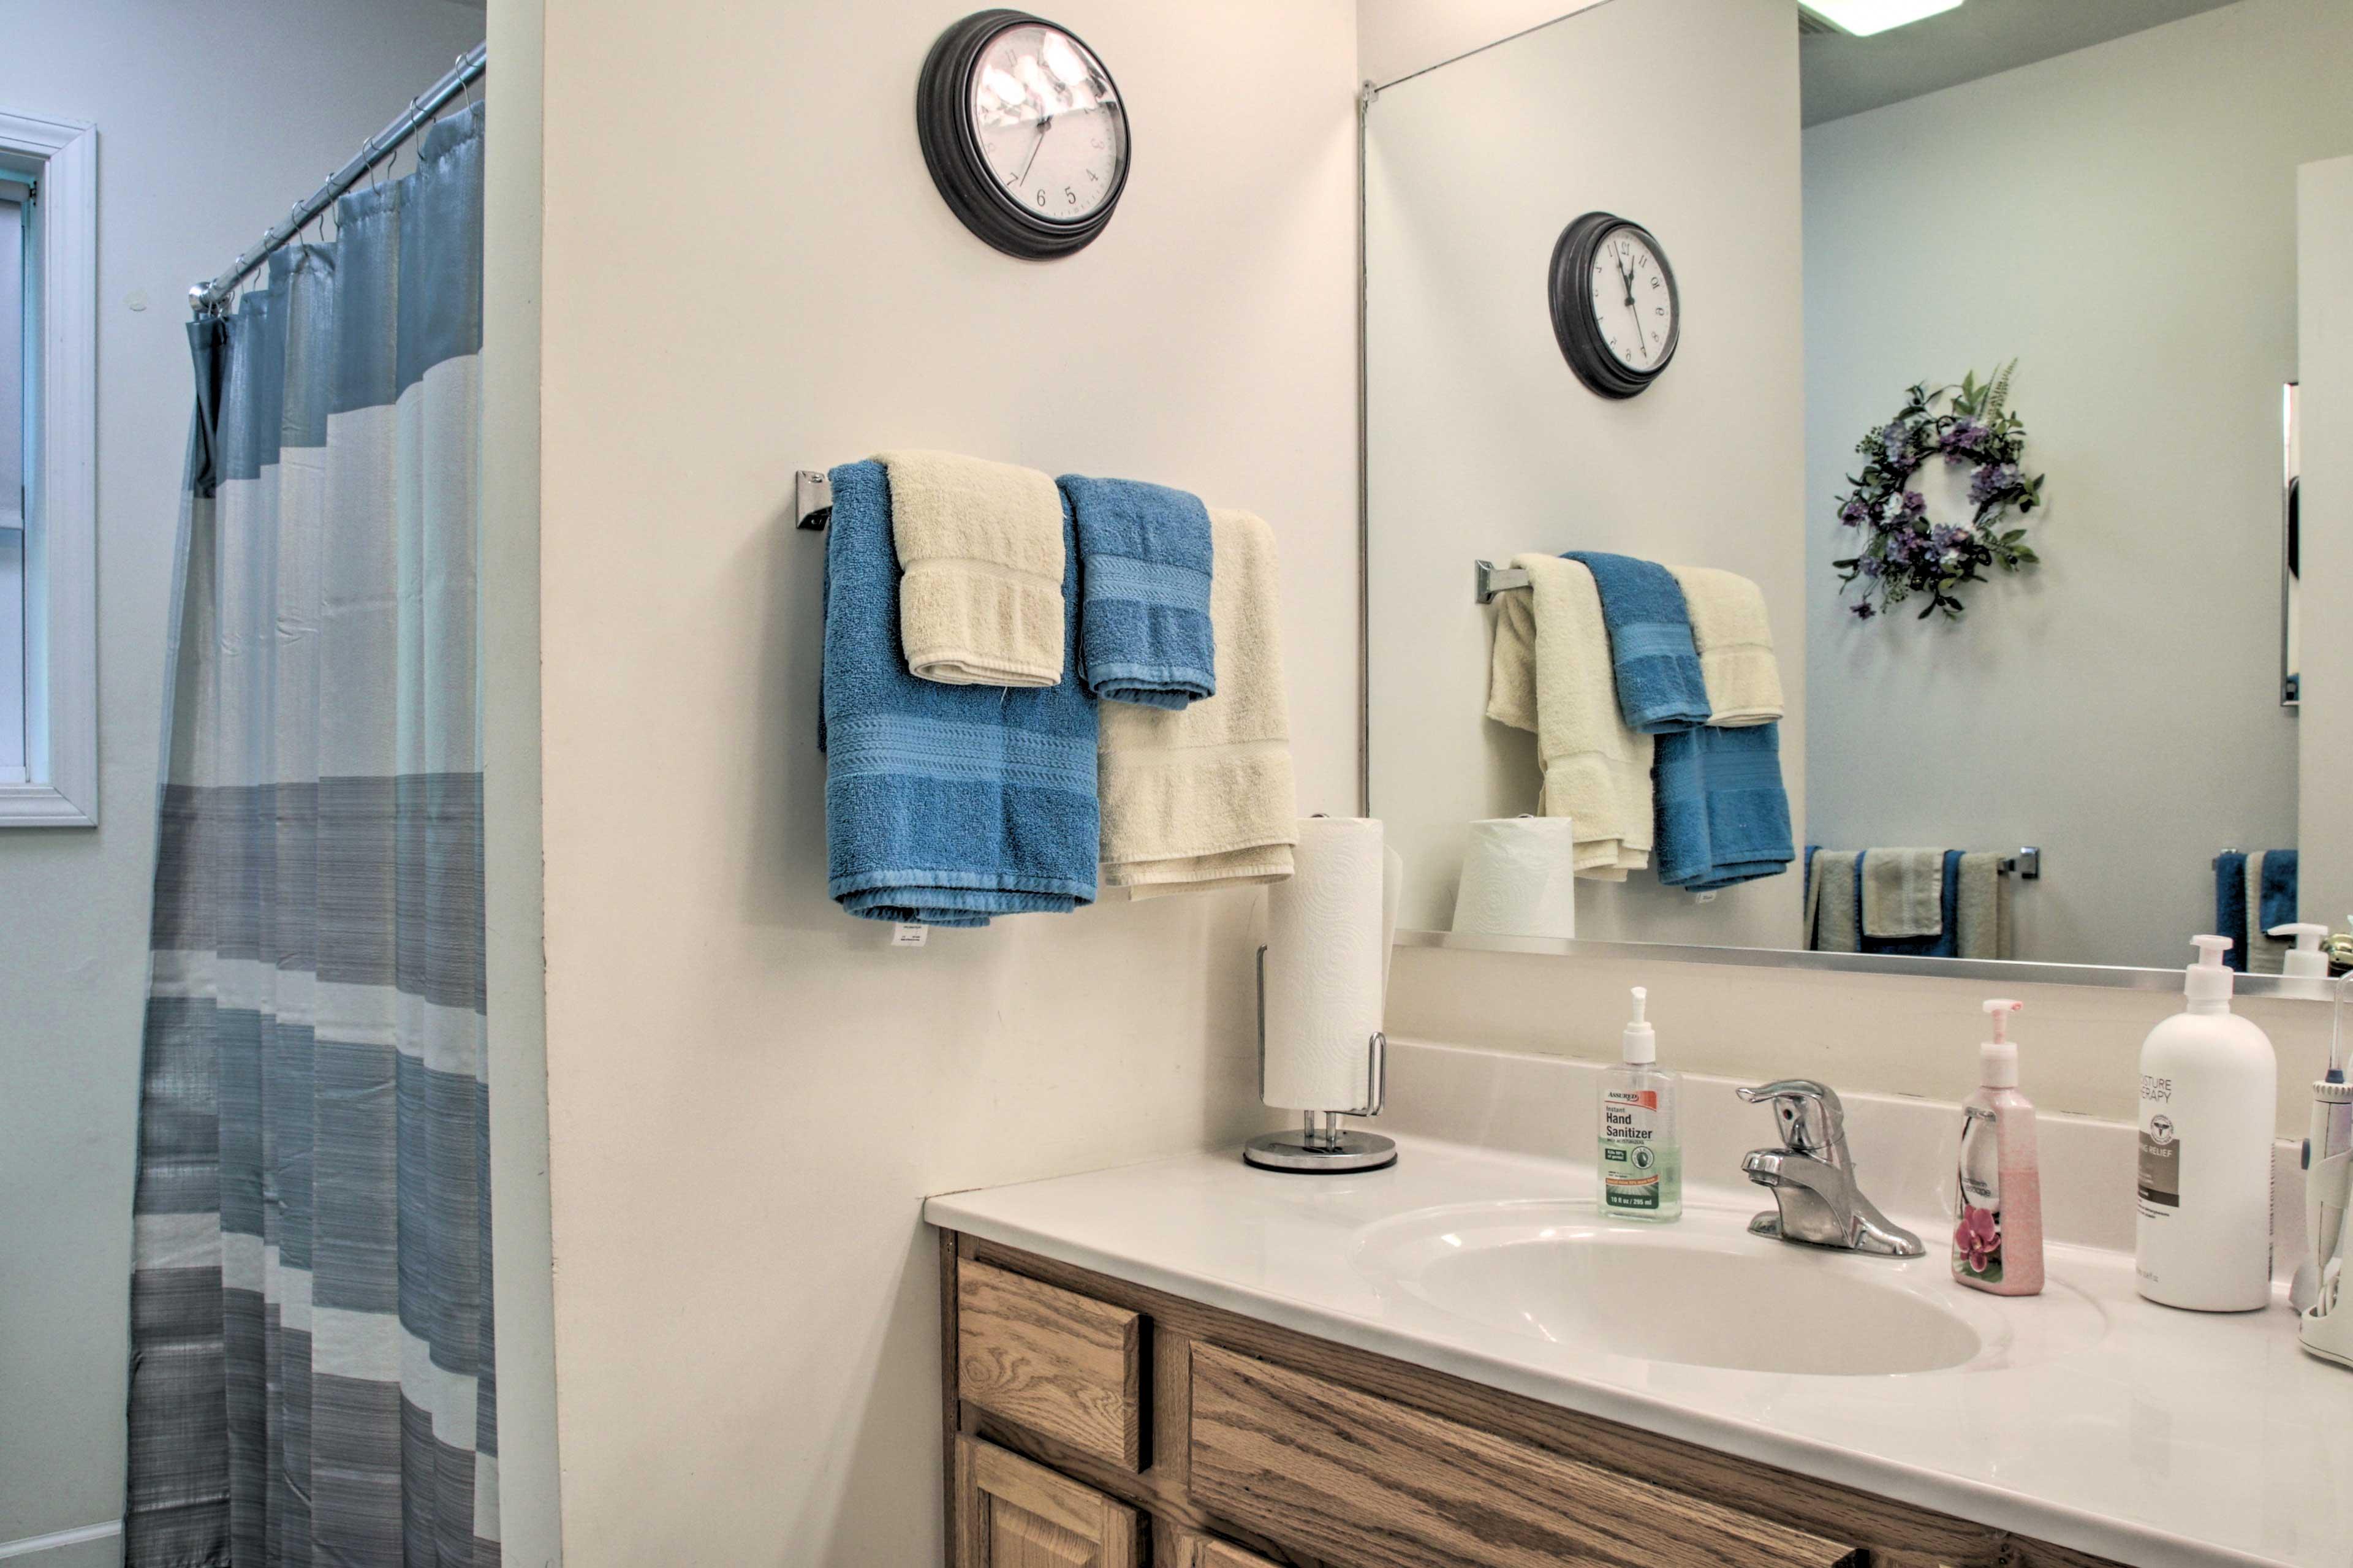 Bathroom   Ground Floor   Complimentary Toiletries   Towels Provided